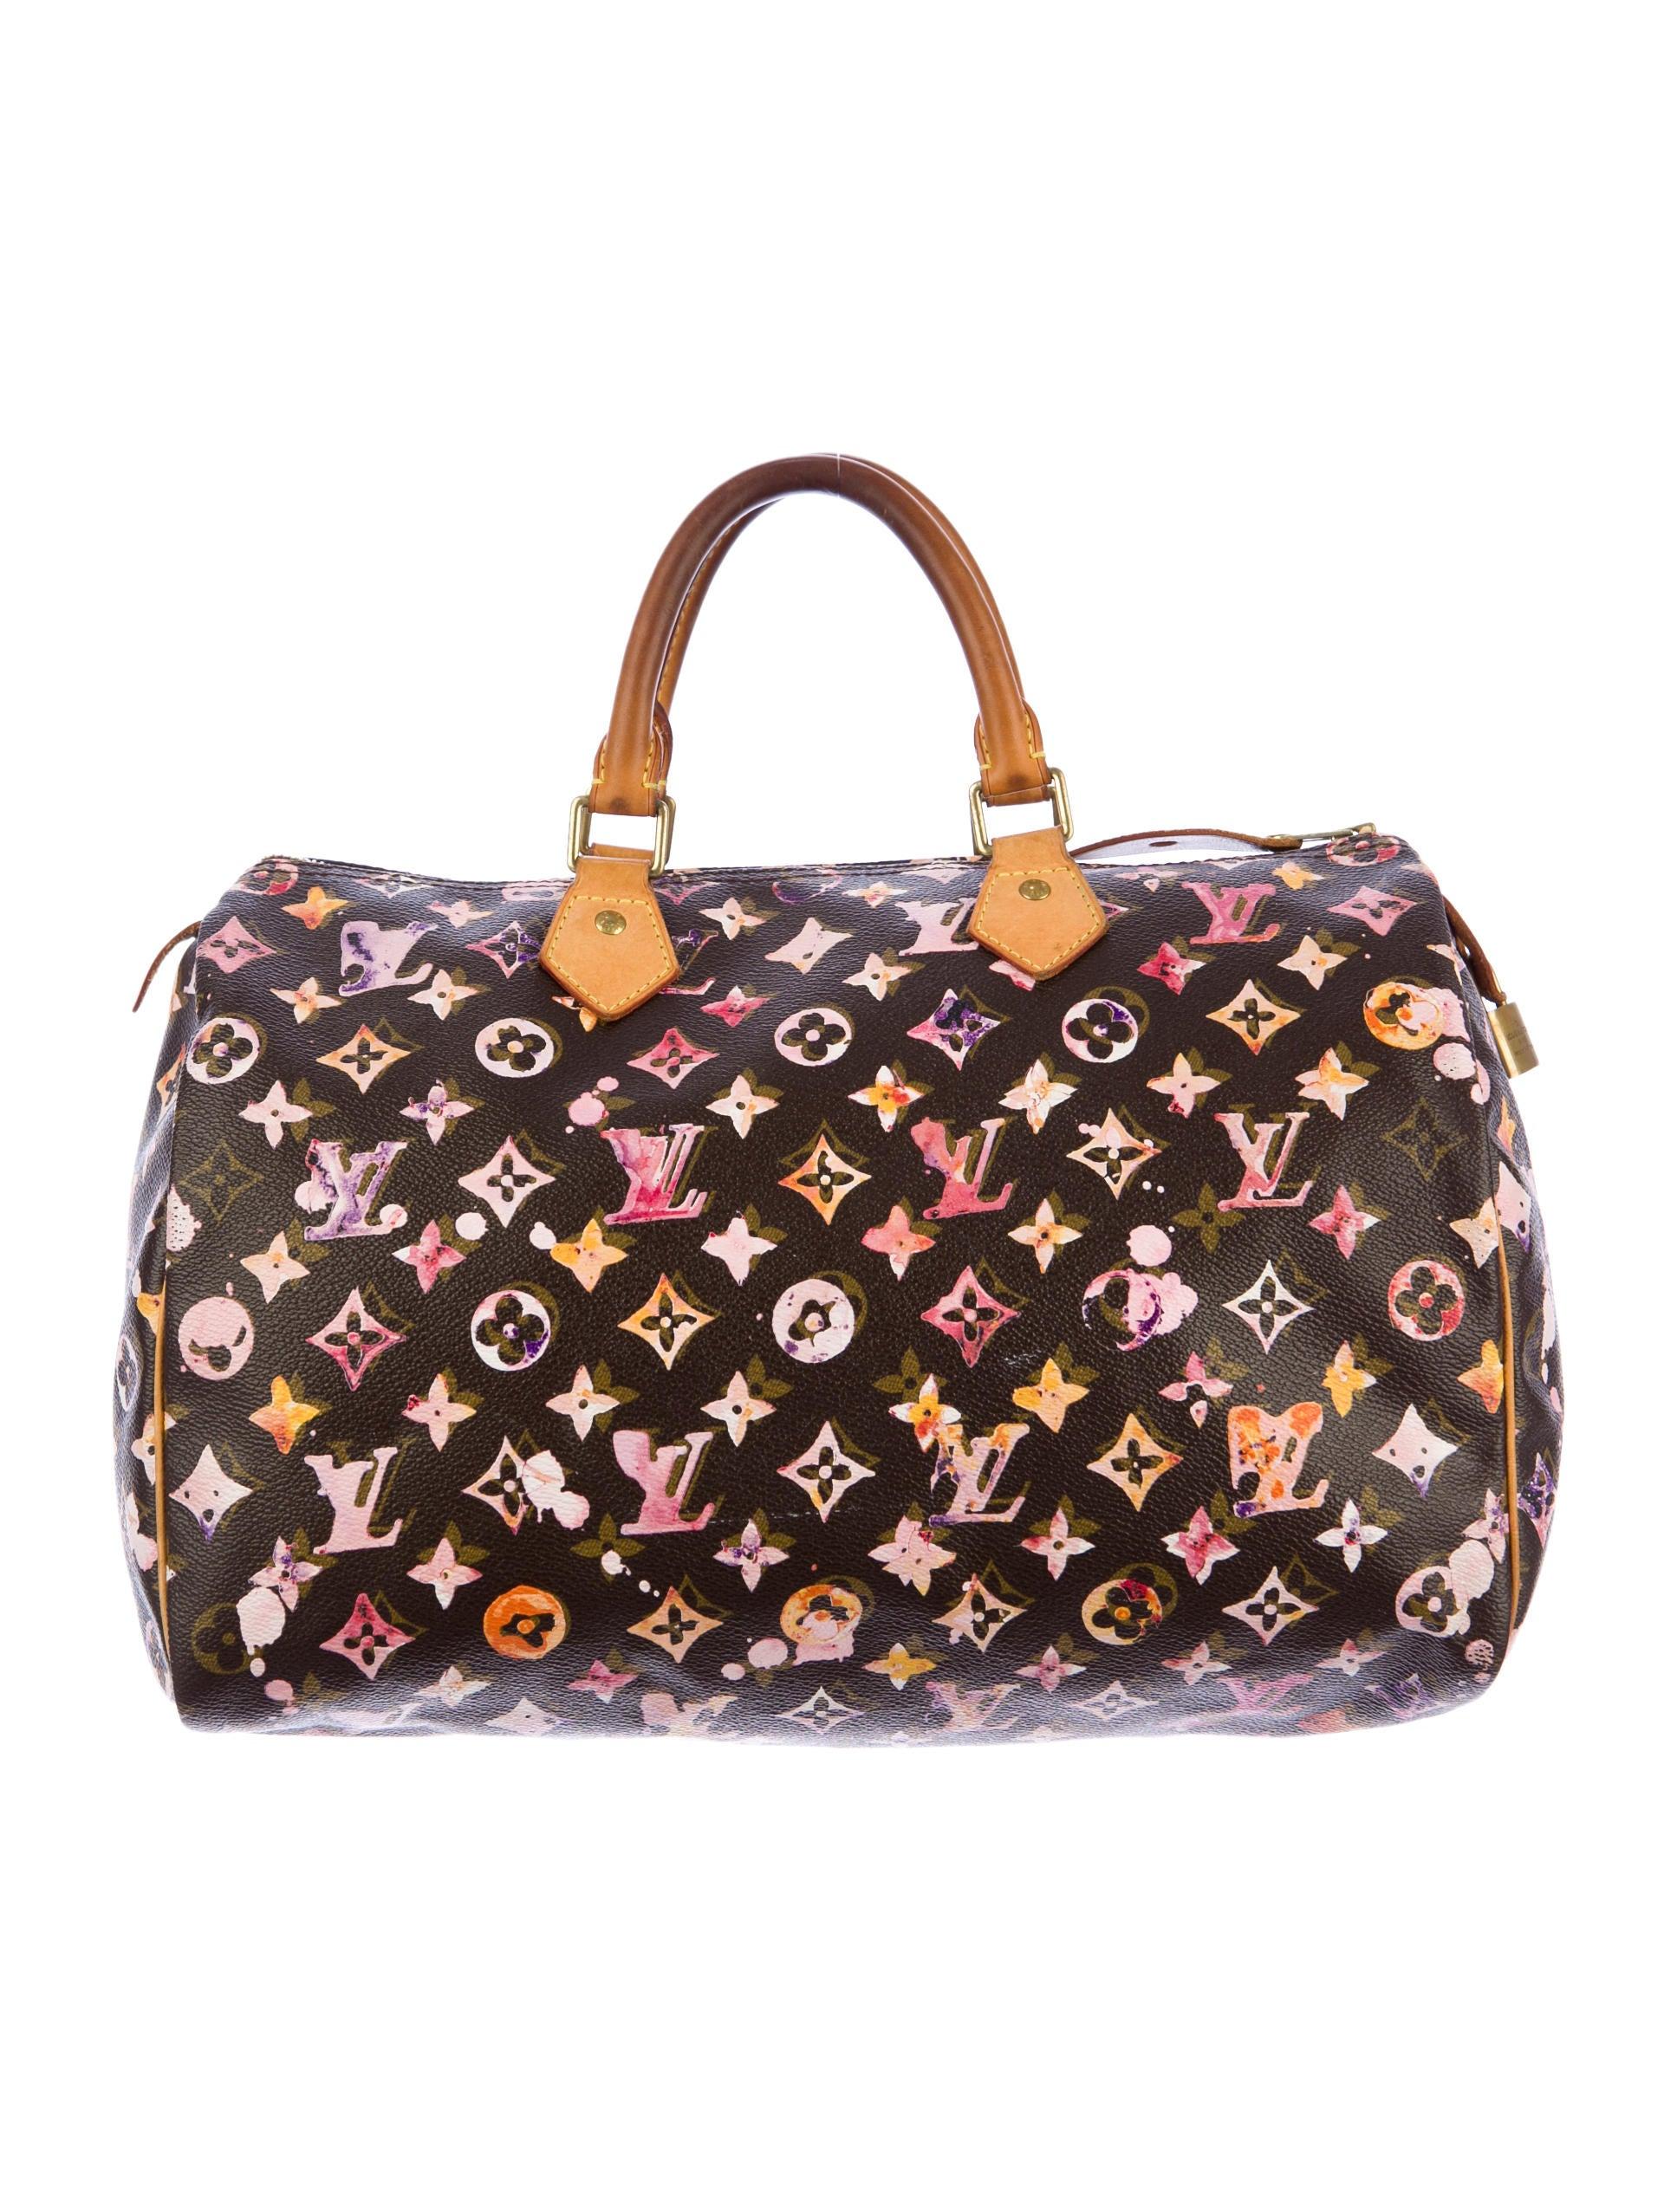 louis vuitton aquarelle speedy 35 handbags lou31271. Black Bedroom Furniture Sets. Home Design Ideas